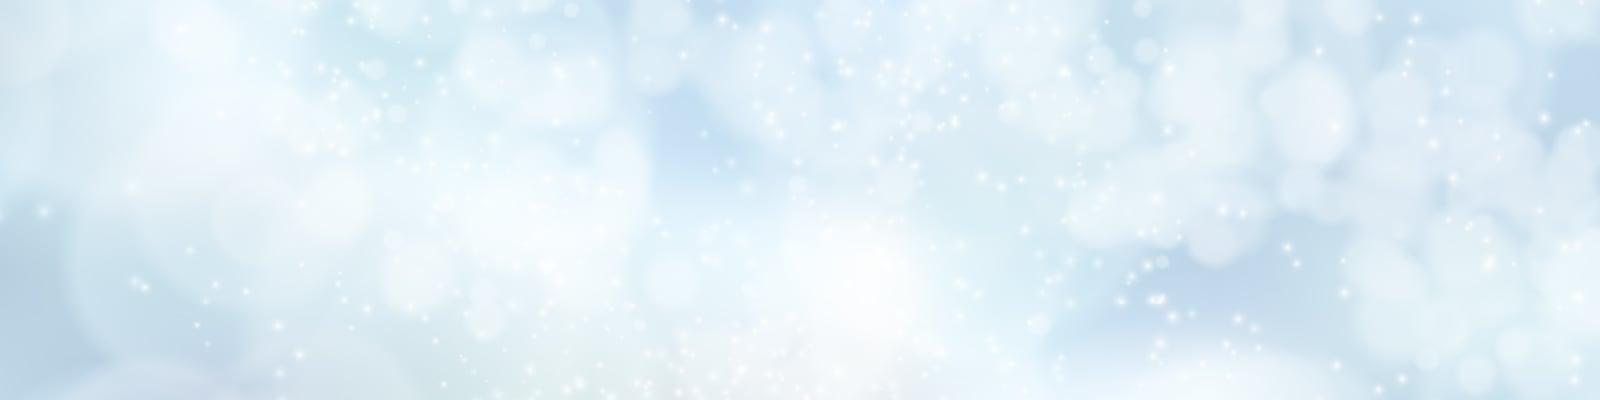 G-Suite-White-paper---COVID-19-banner